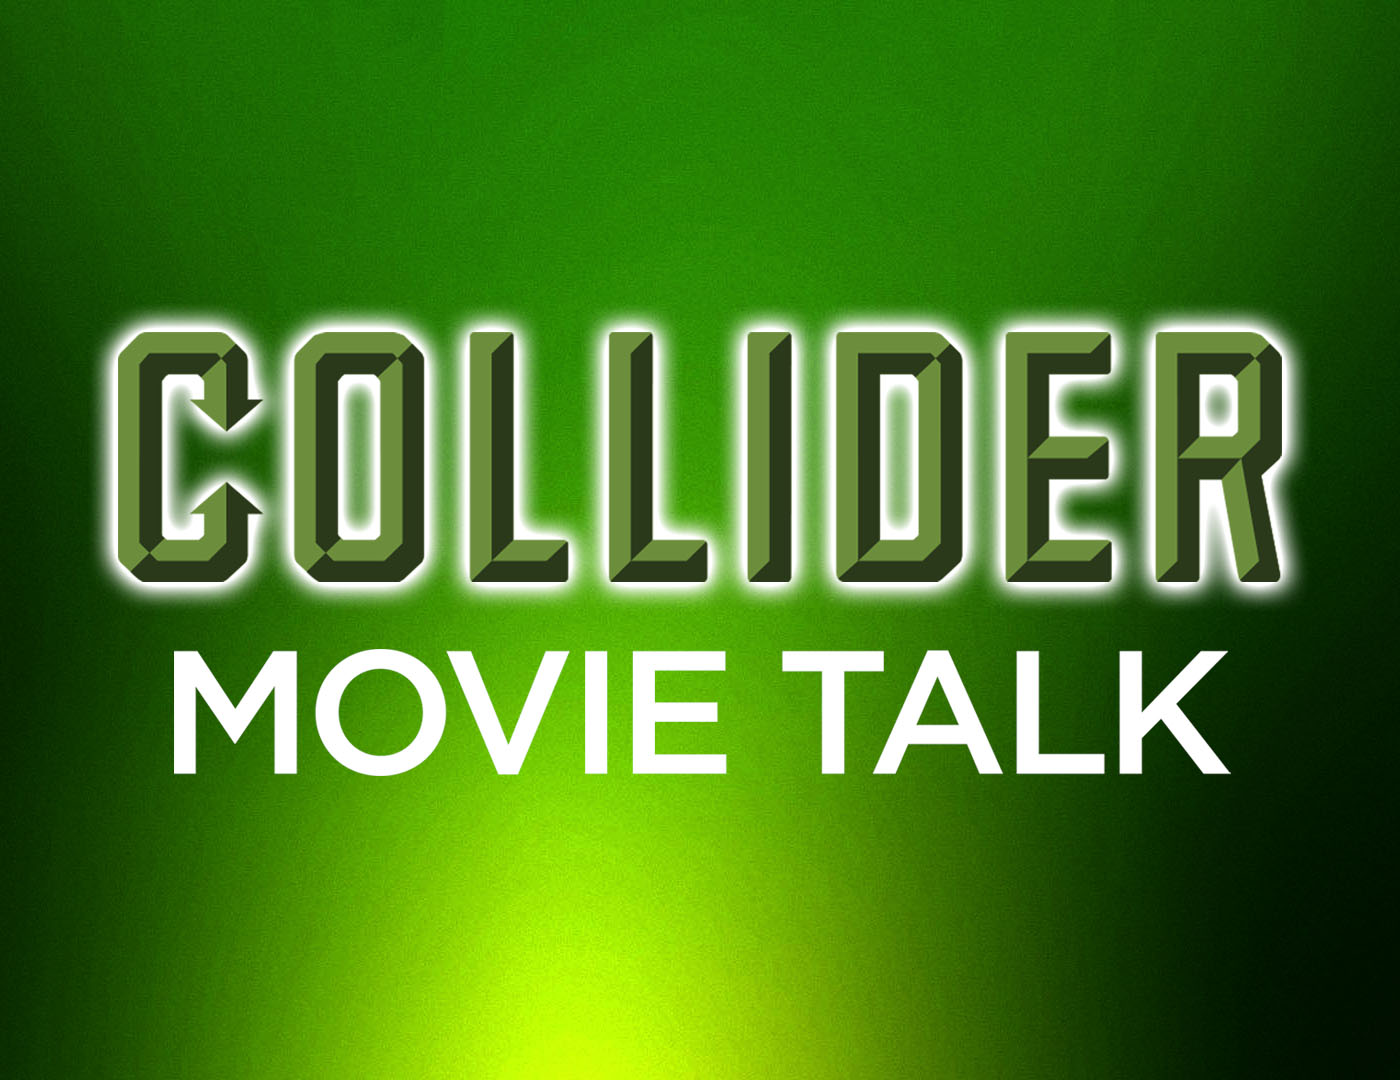 Collider Movie Talk - Dungeons & Dragons Movie Casts Ansel Elgort, Minecraft Movie Gets Release Date